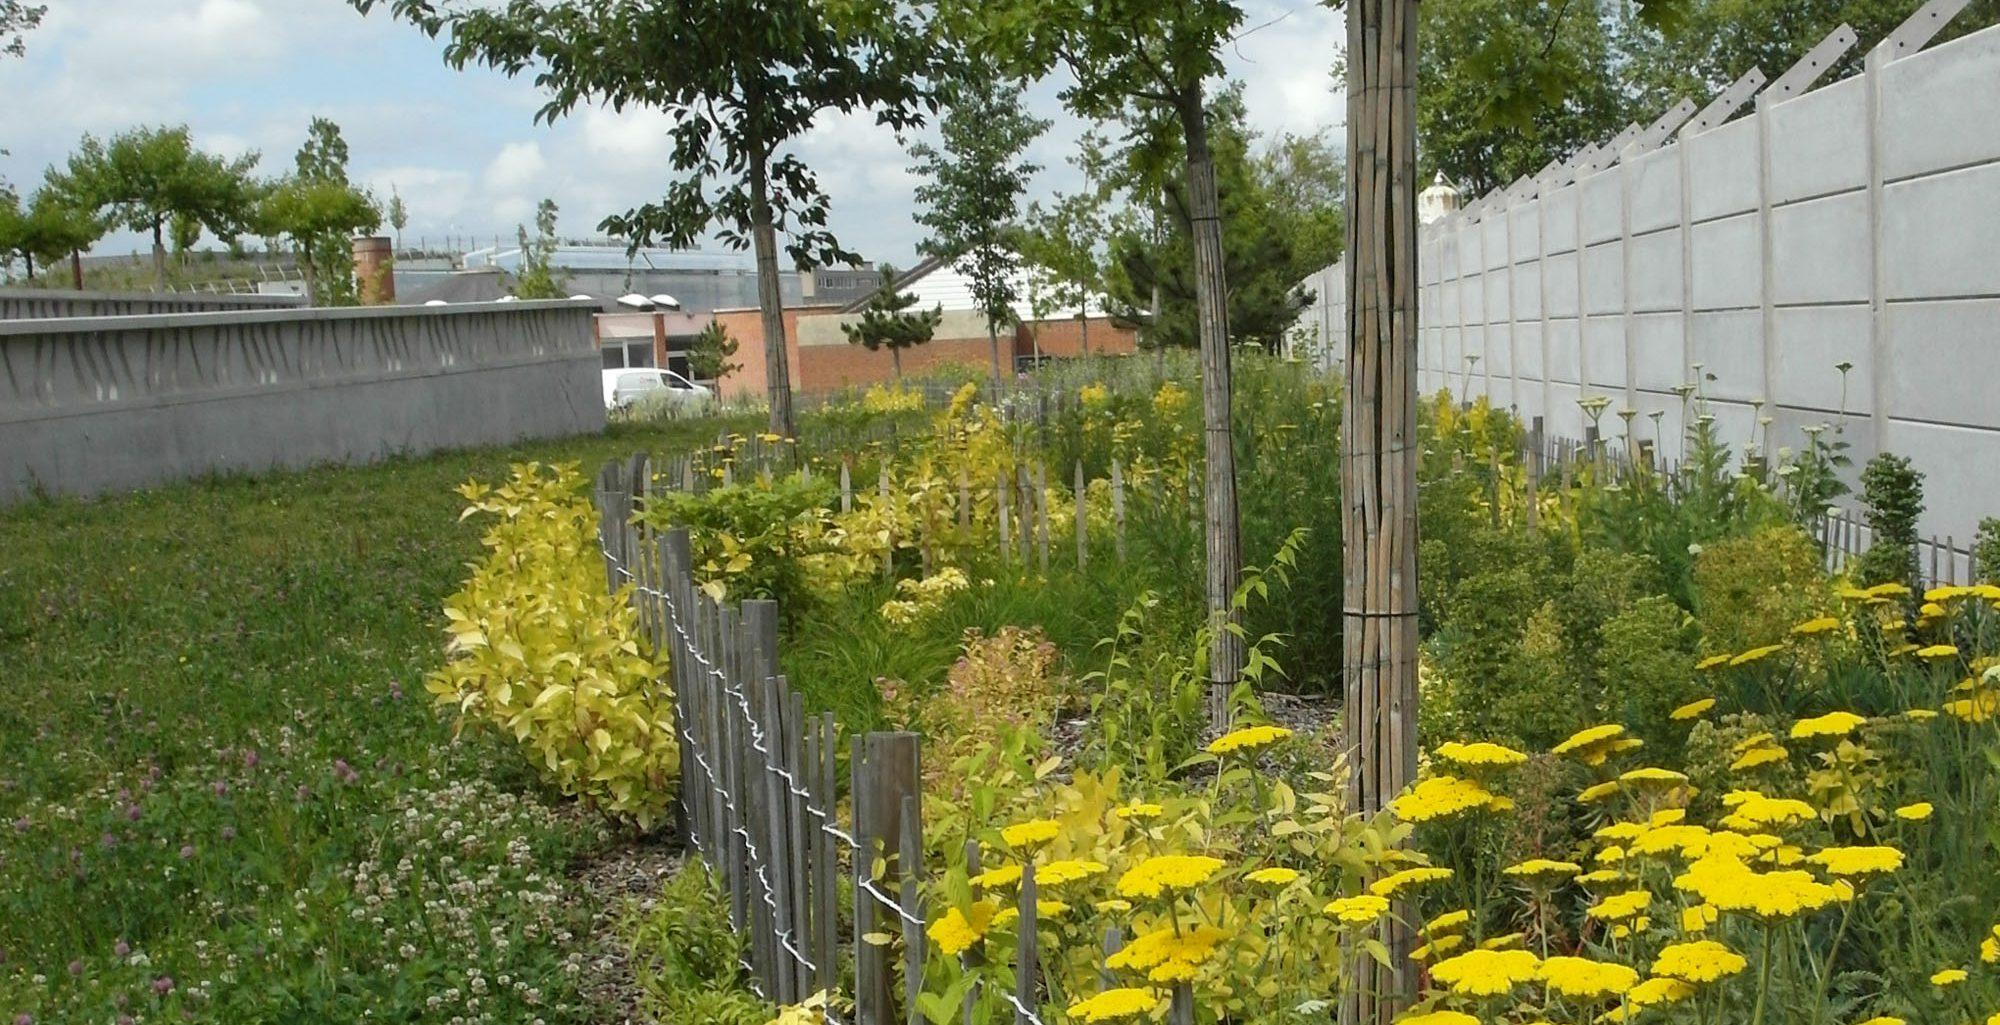 Achillea millefolium et Euphorbia characias étoffent les massifs jaunes